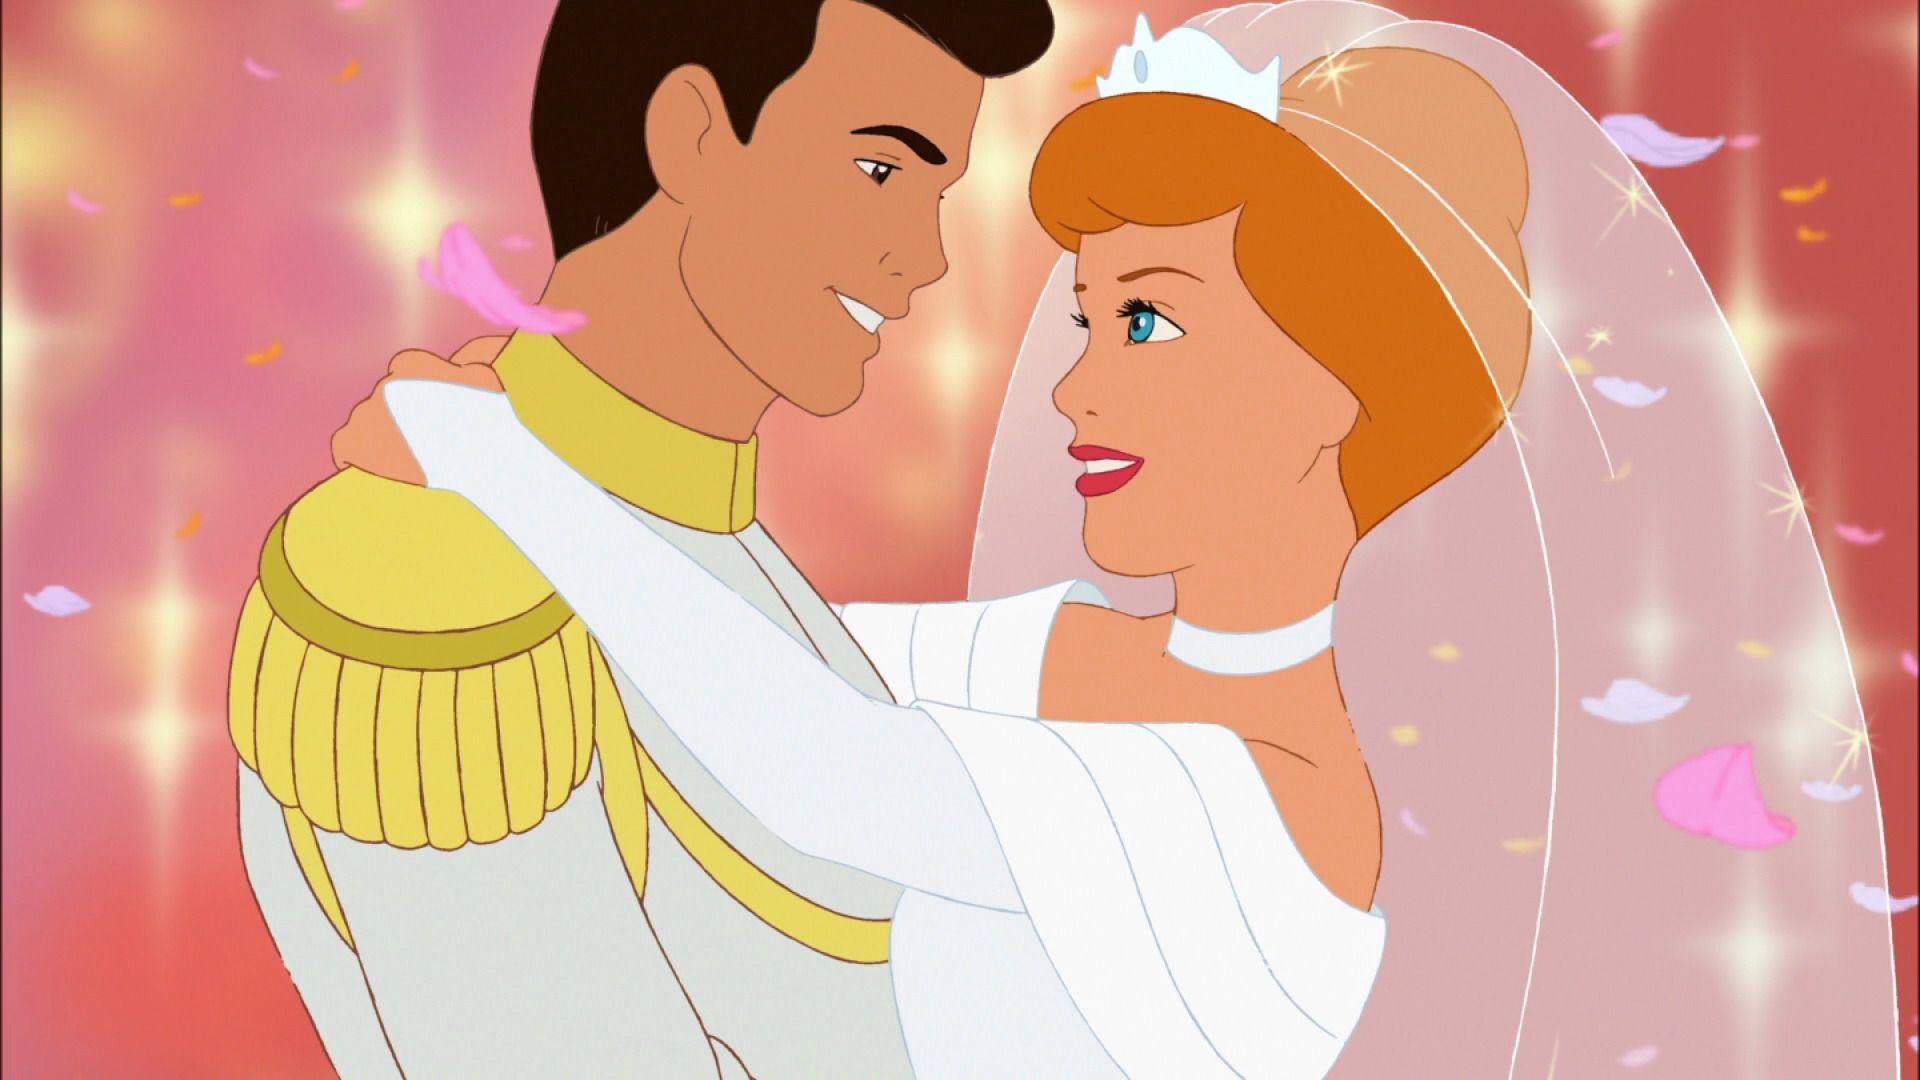 cinderella and prince charmings wedding day to live